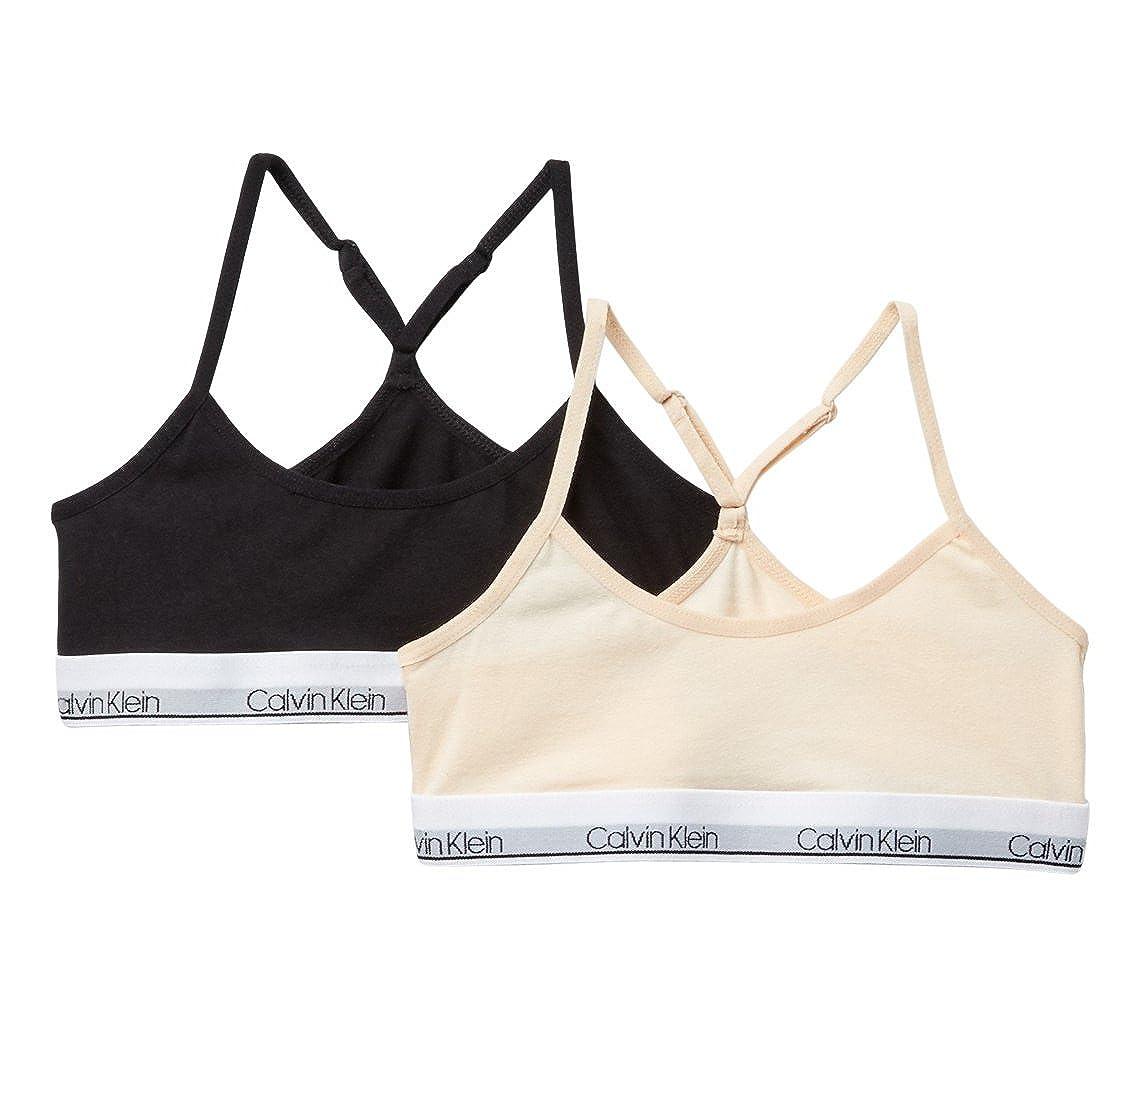 583109acab58b9 Amazon.com  Calvin Klein Girl`s Modern Cotton Racerback Bralette 2 Pack  (Nude(HC6108) Black White